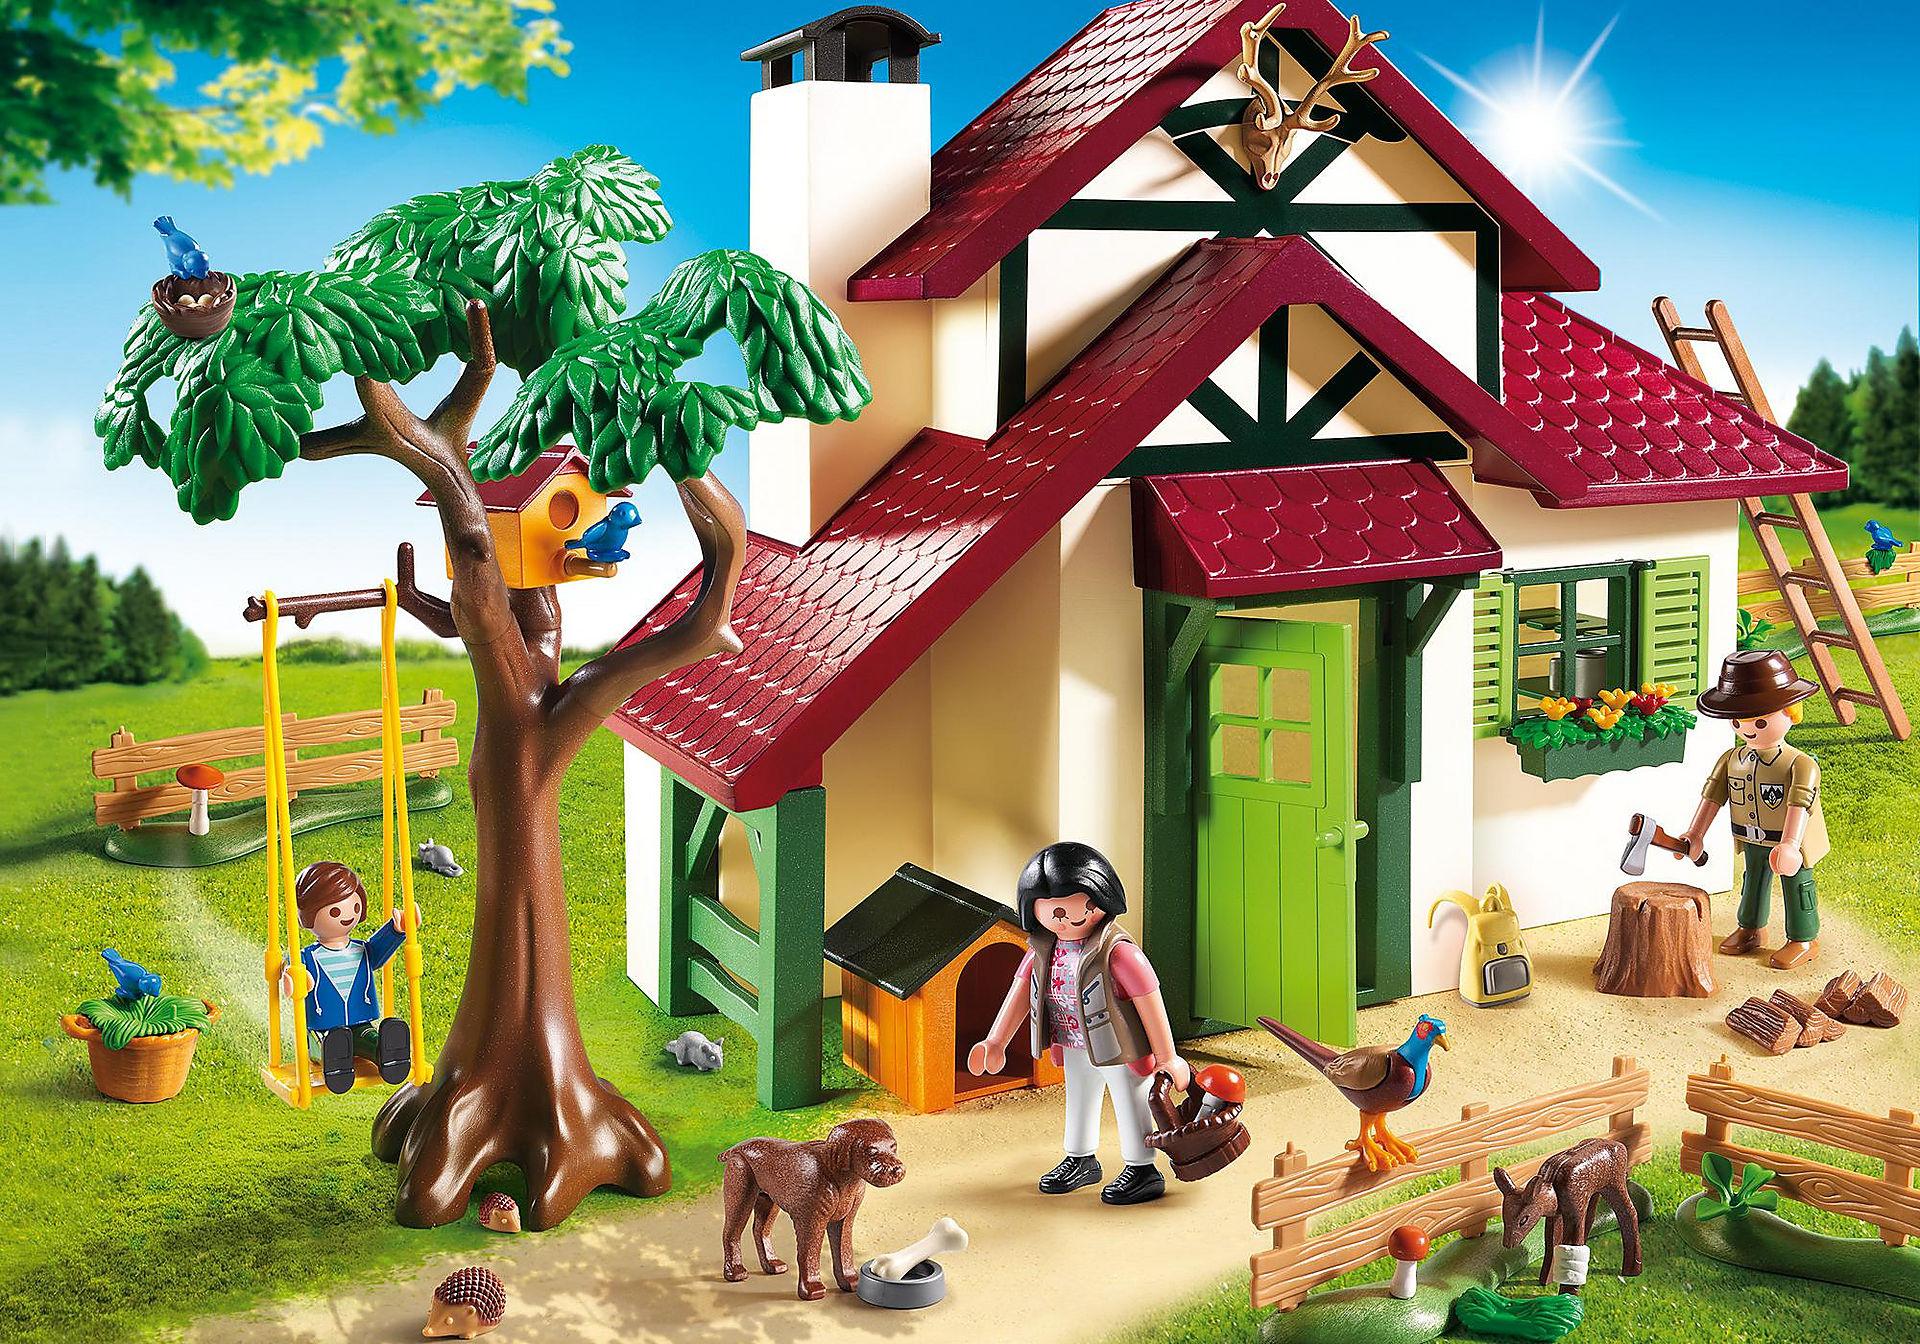 http://media.playmobil.com/i/playmobil/6811_product_detail/Maison forestière